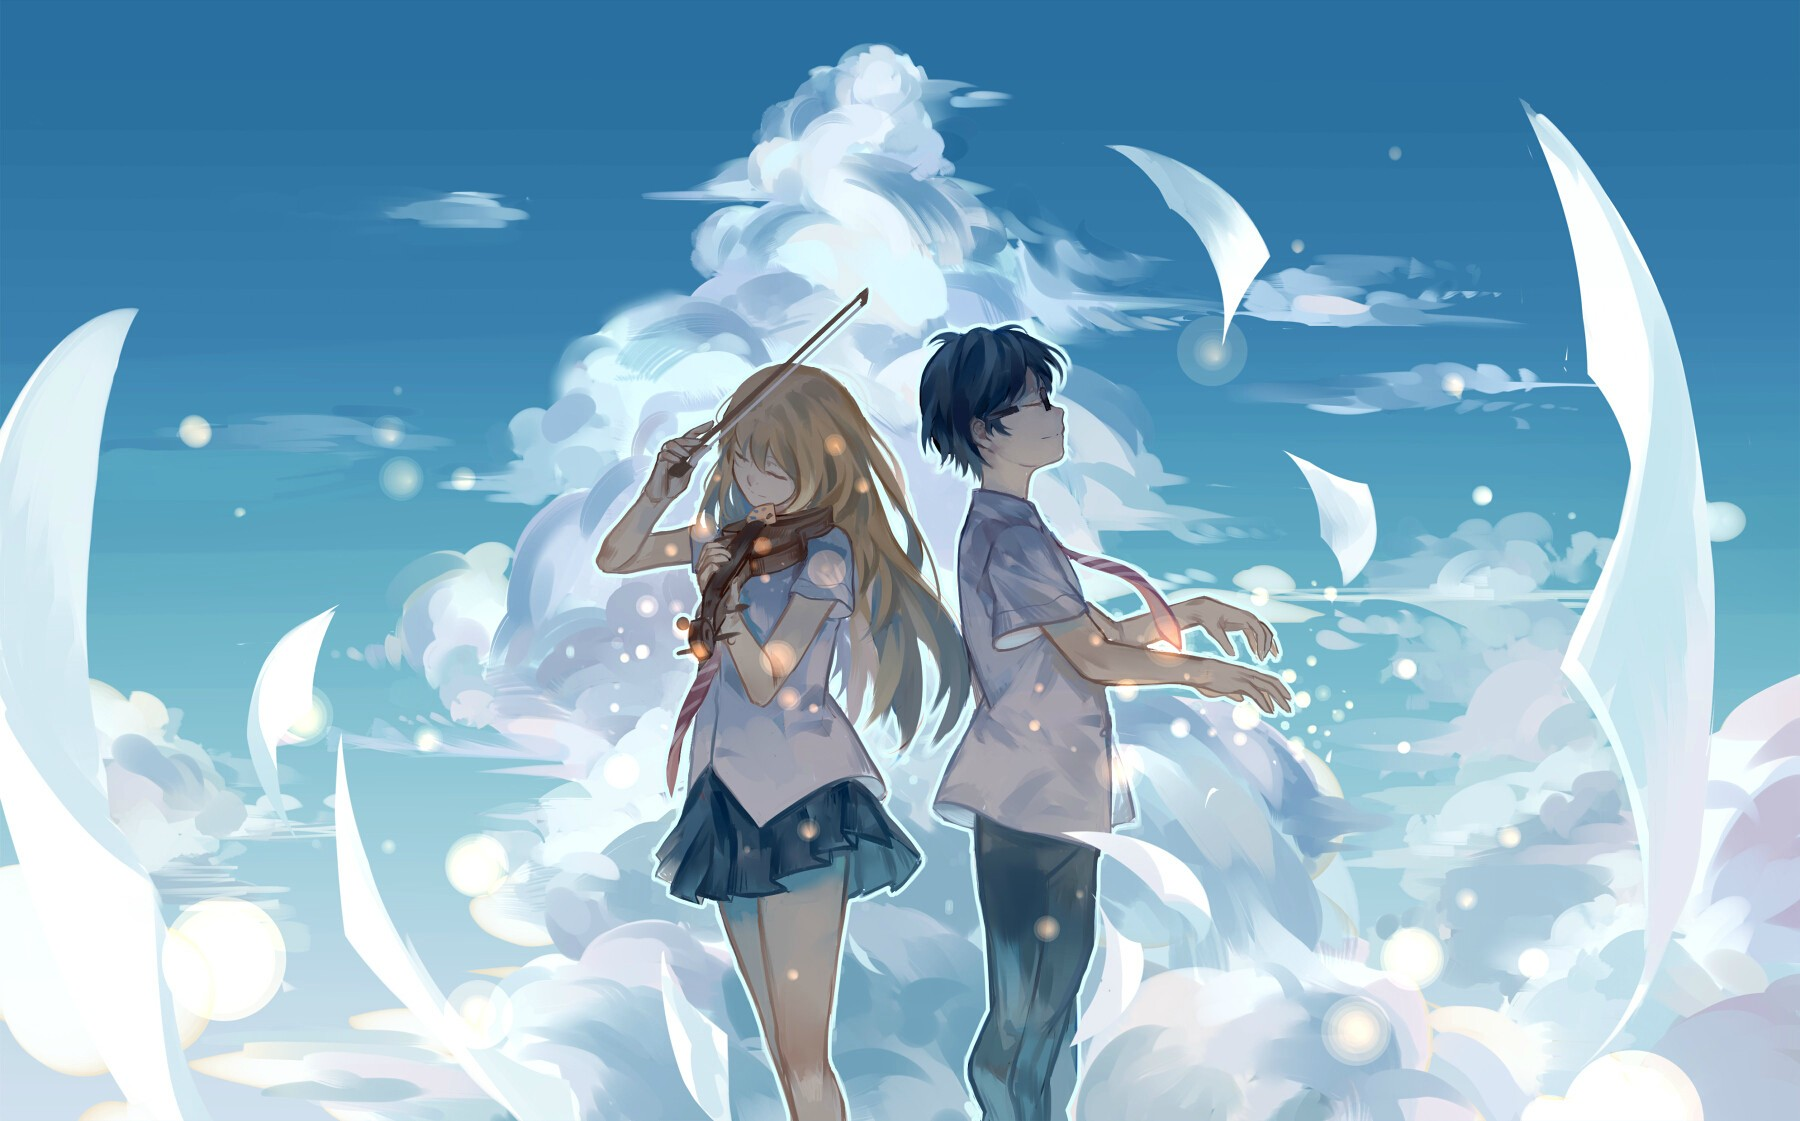 Anime Made Me Realise I Needed Help